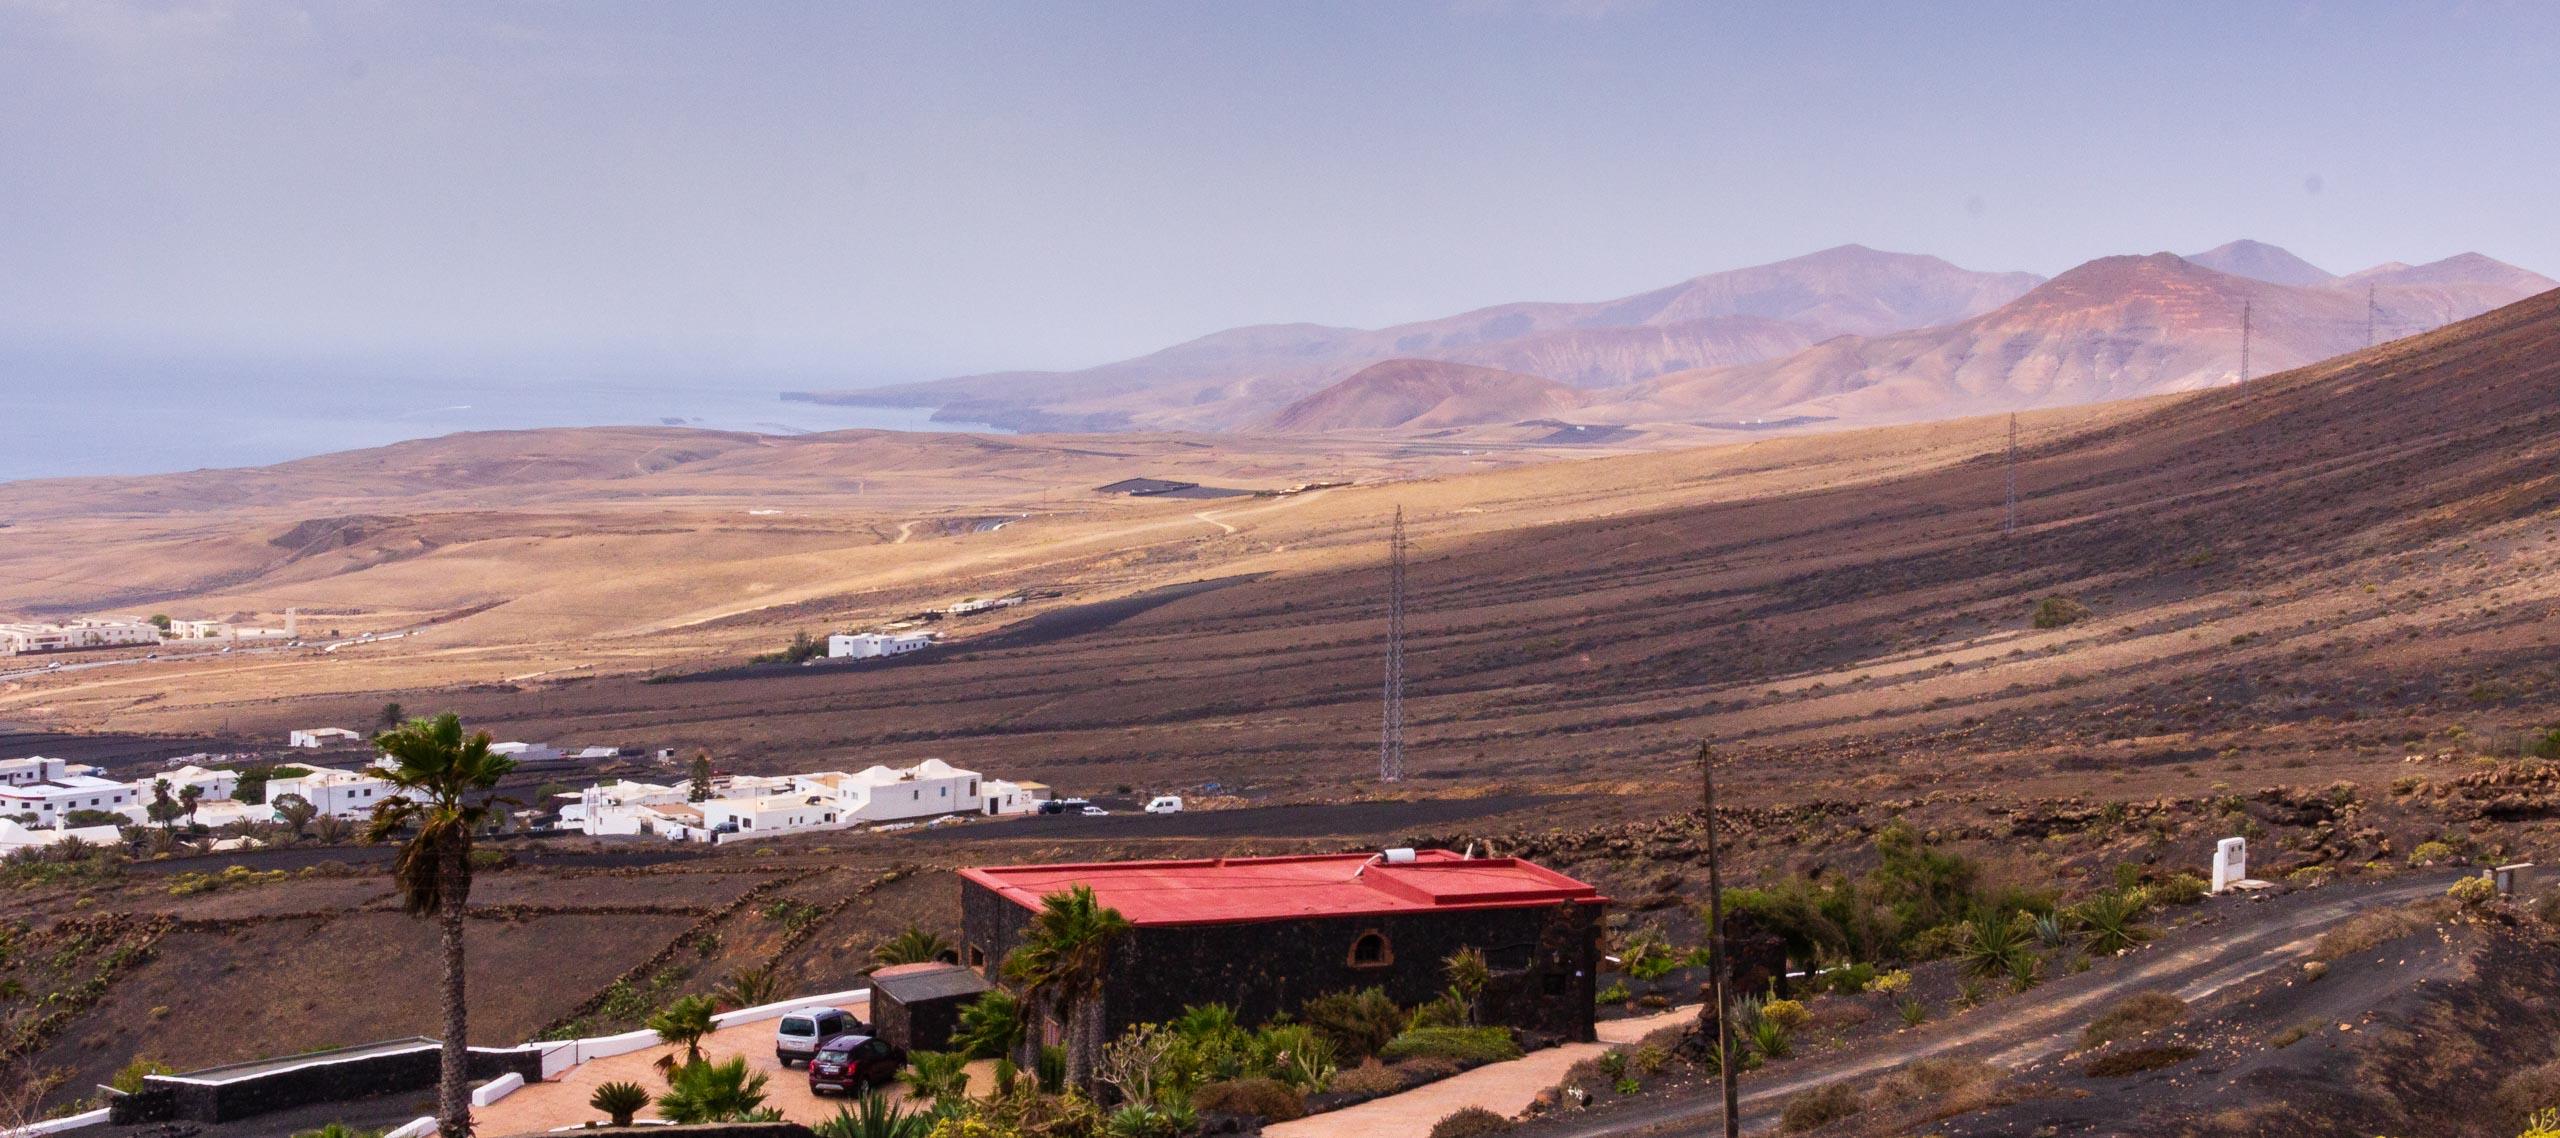 2018 08 Lanzarote AboveMacher 001